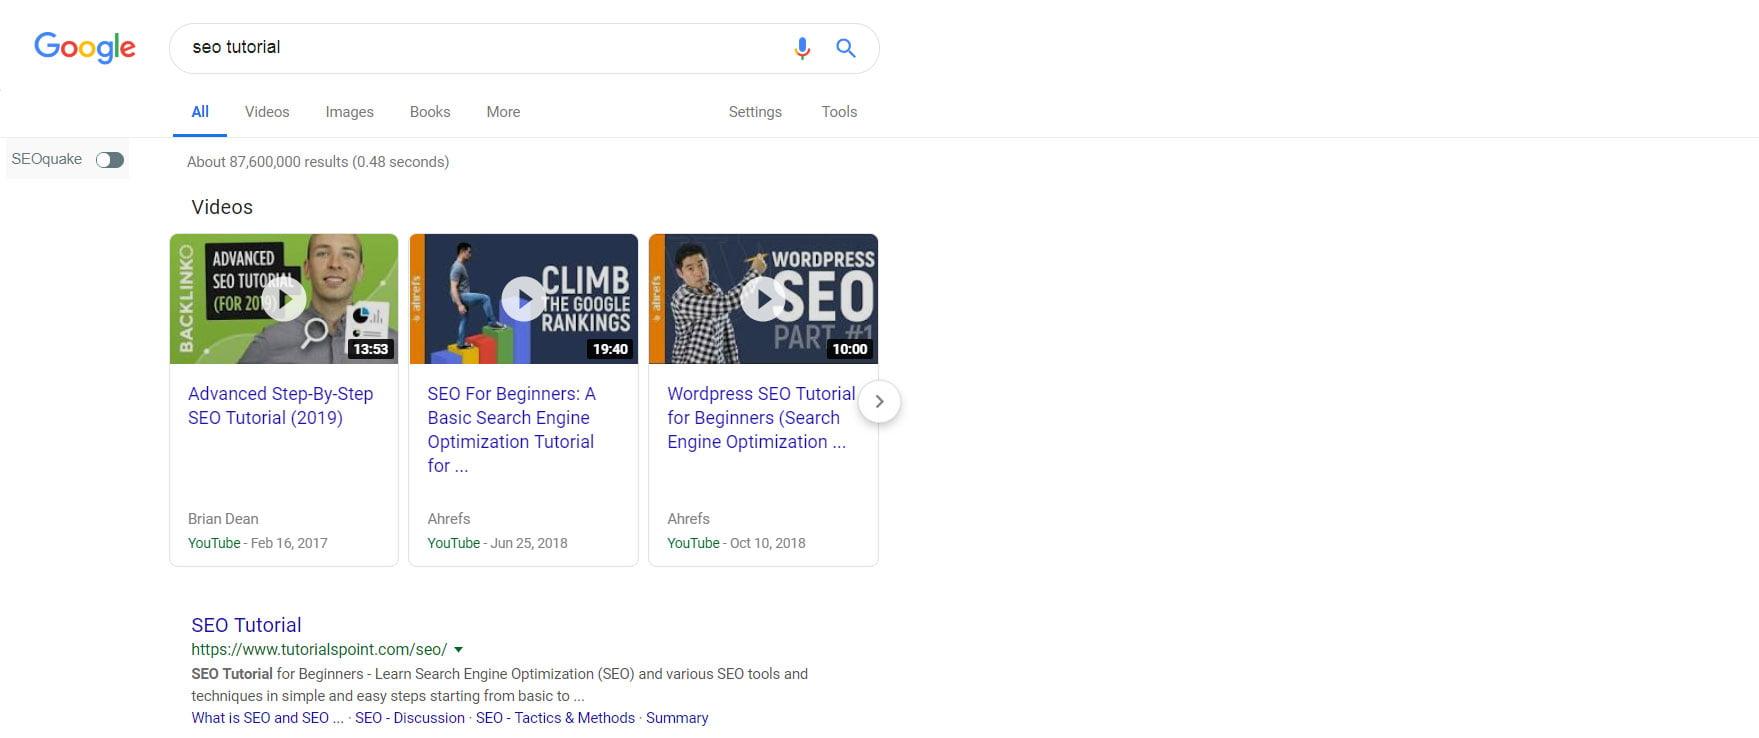 Video optimization on YouTube for Google